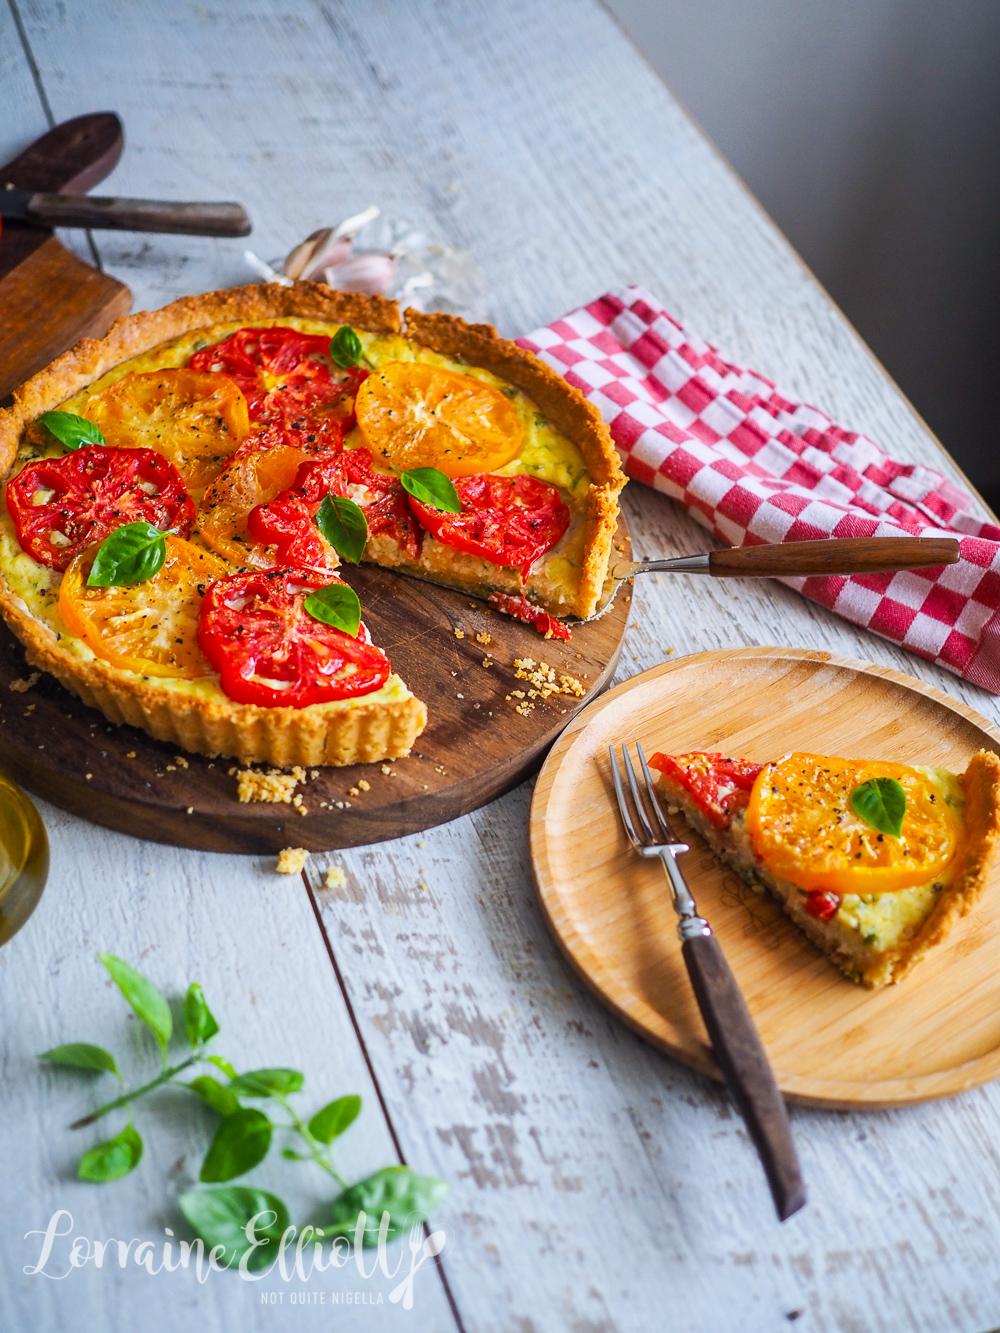 Heirloom Tomato & Goat's Cheese Tart